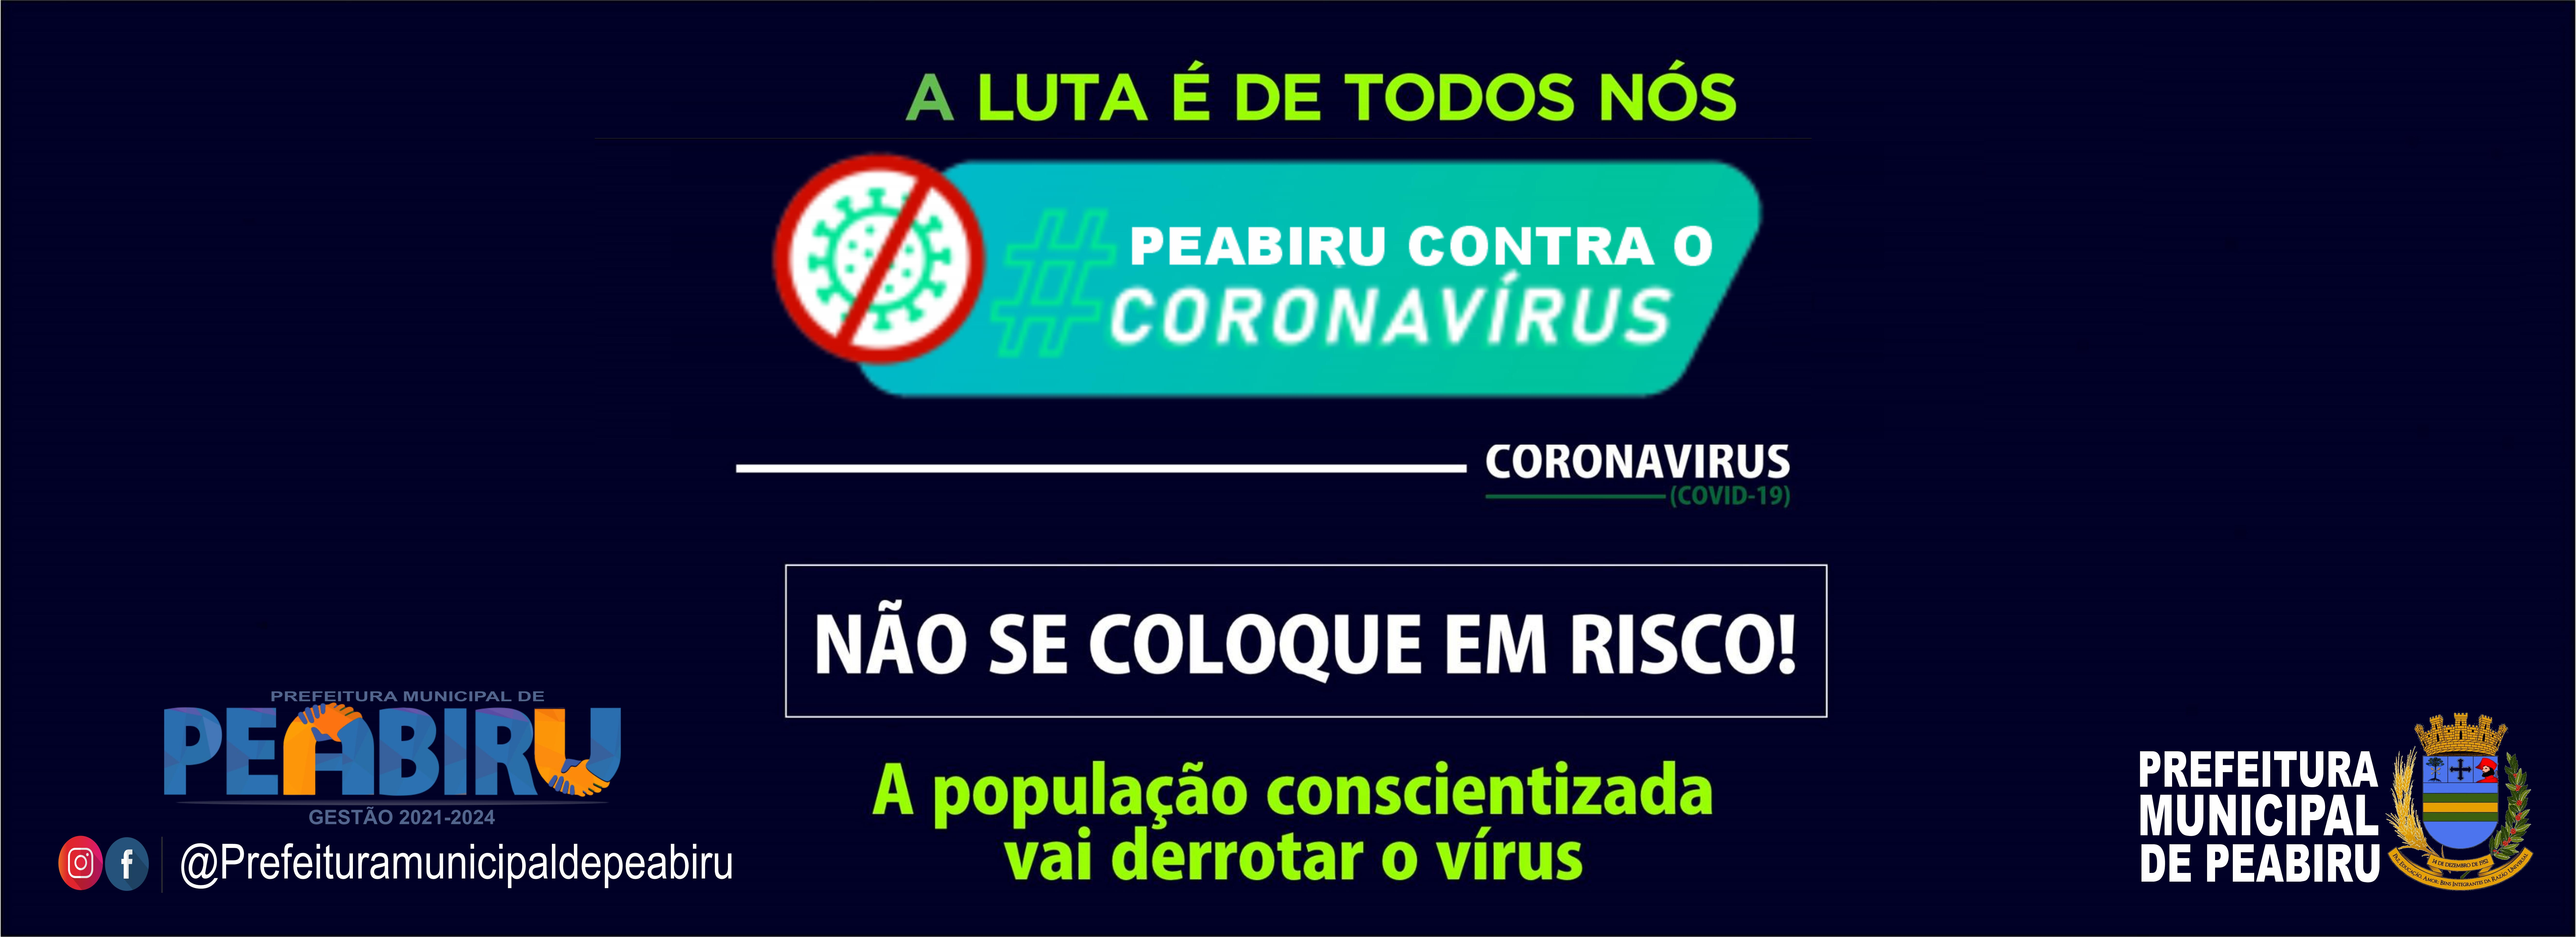 #peabirucontraocoronairus